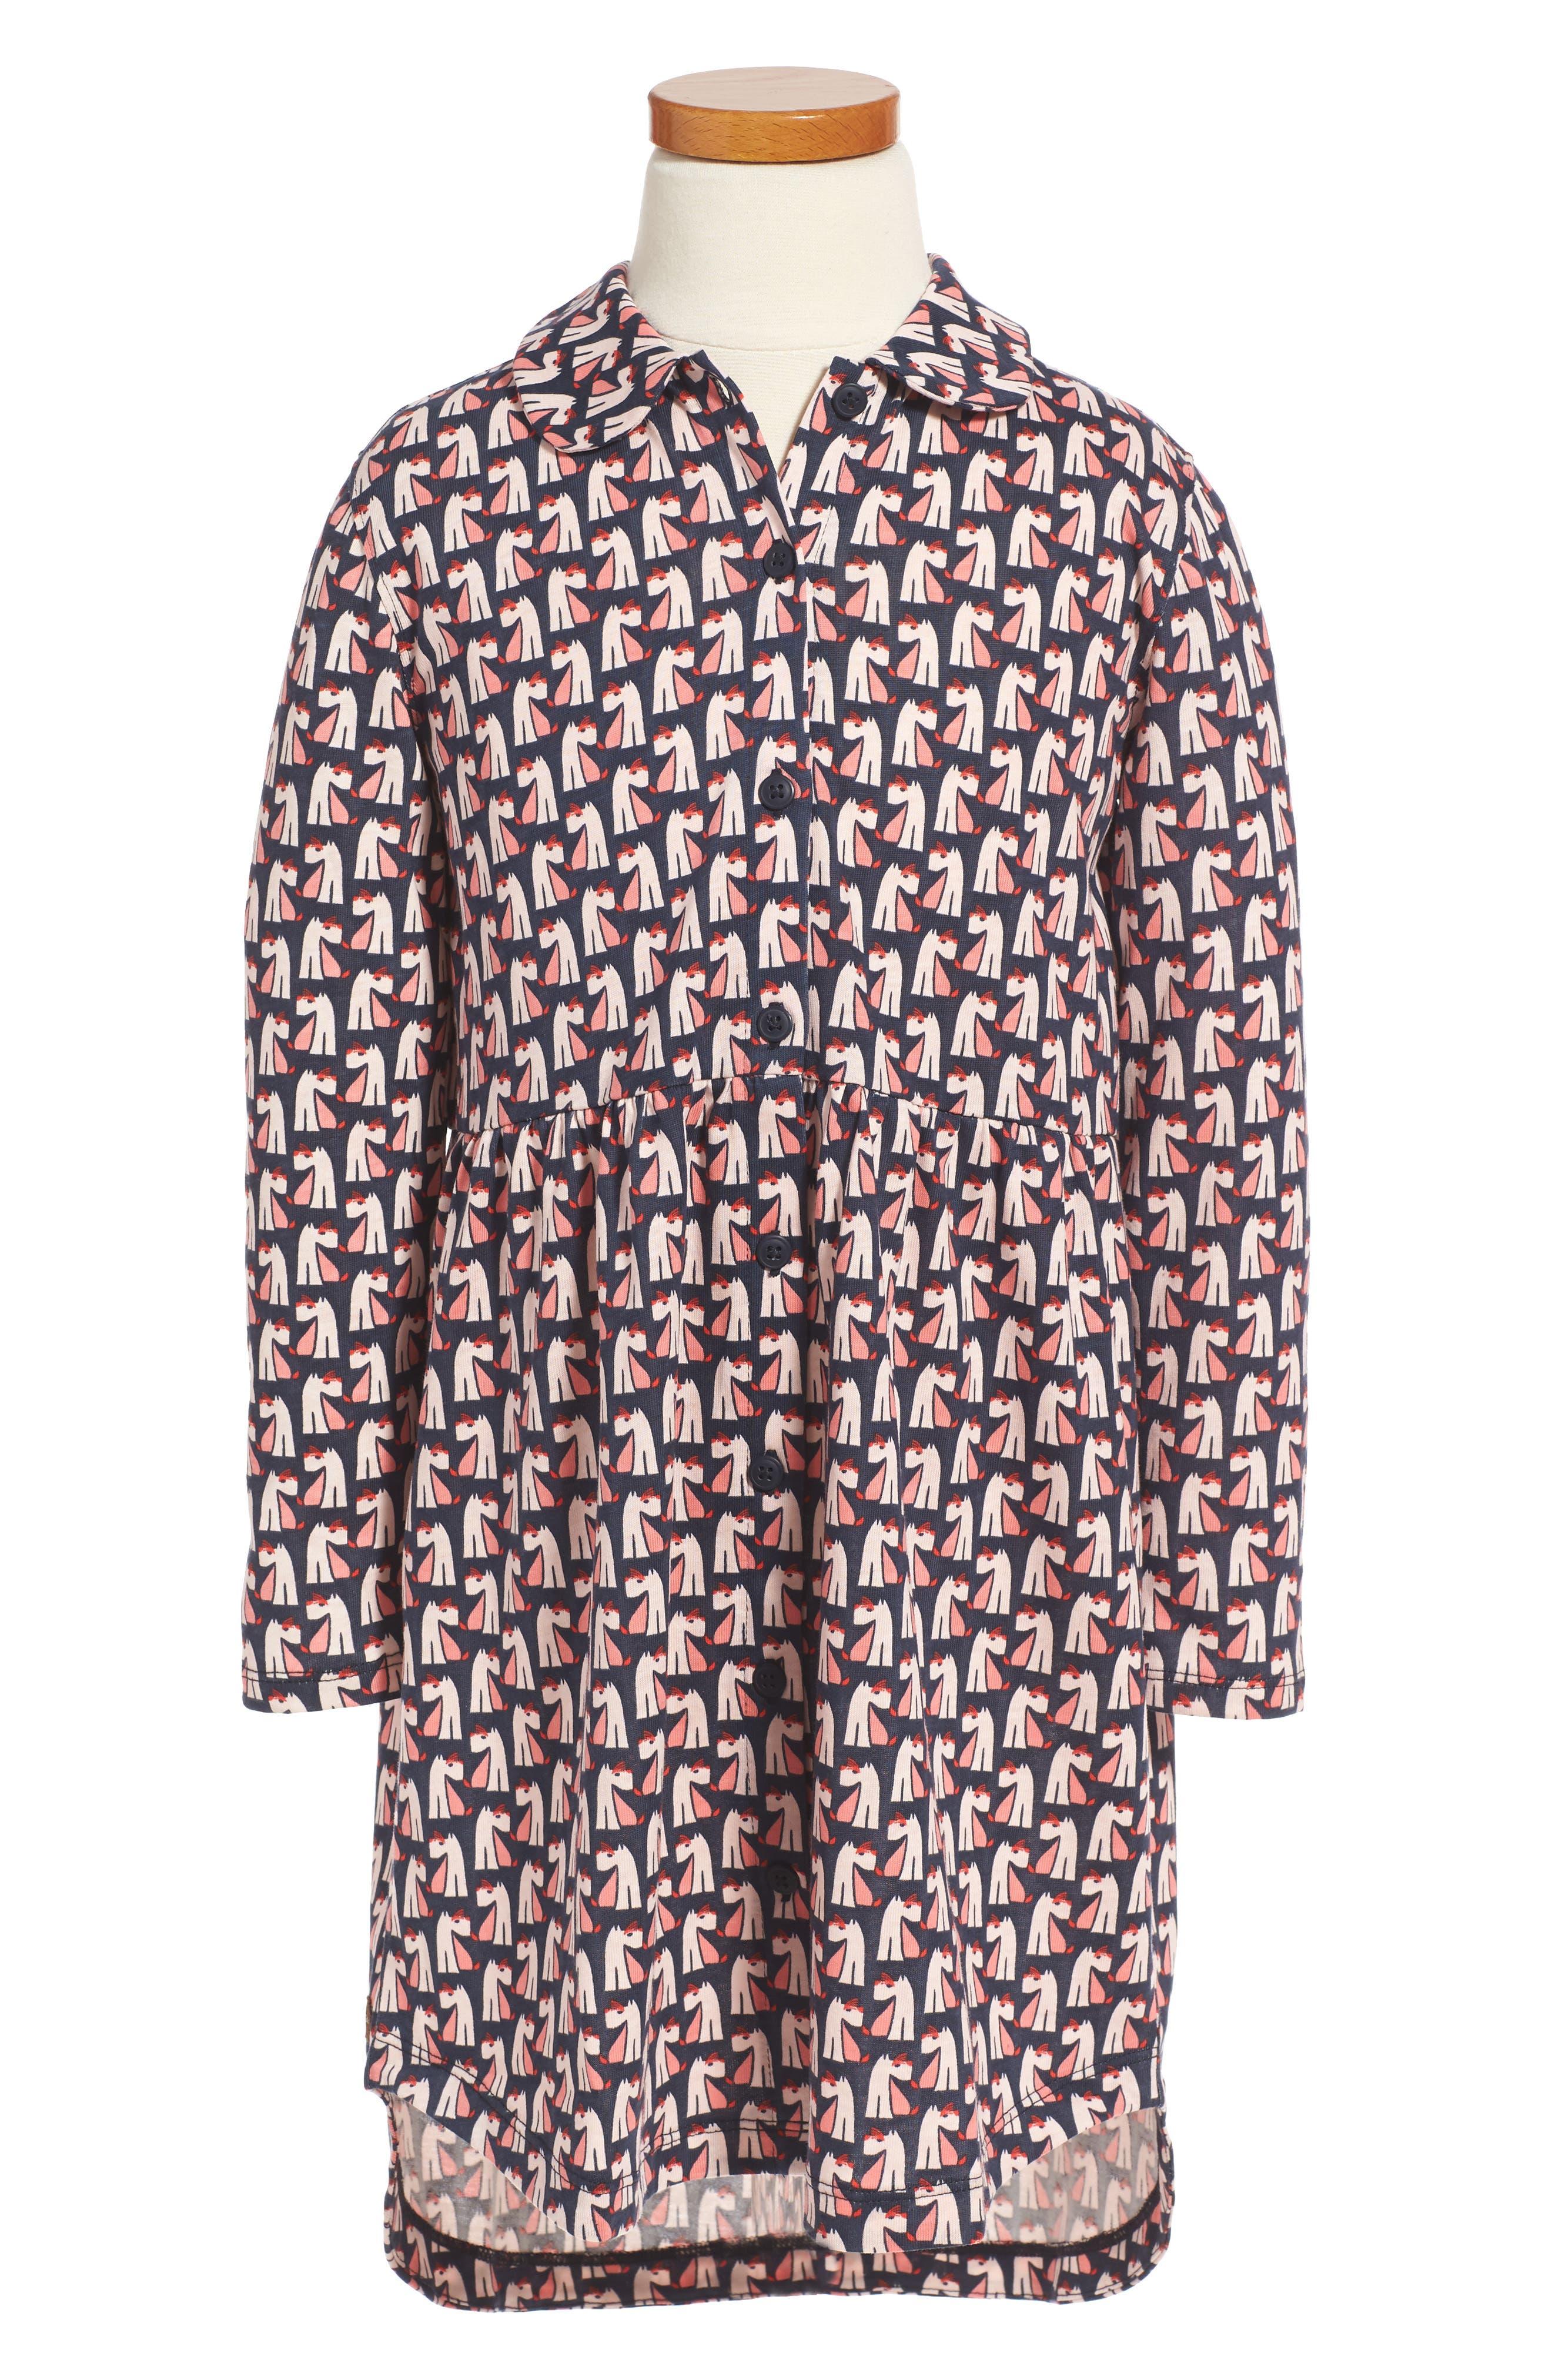 Tea Collection Scottie Dog Shirtdress (Toddler Girls, Little Girls & Big Girls)